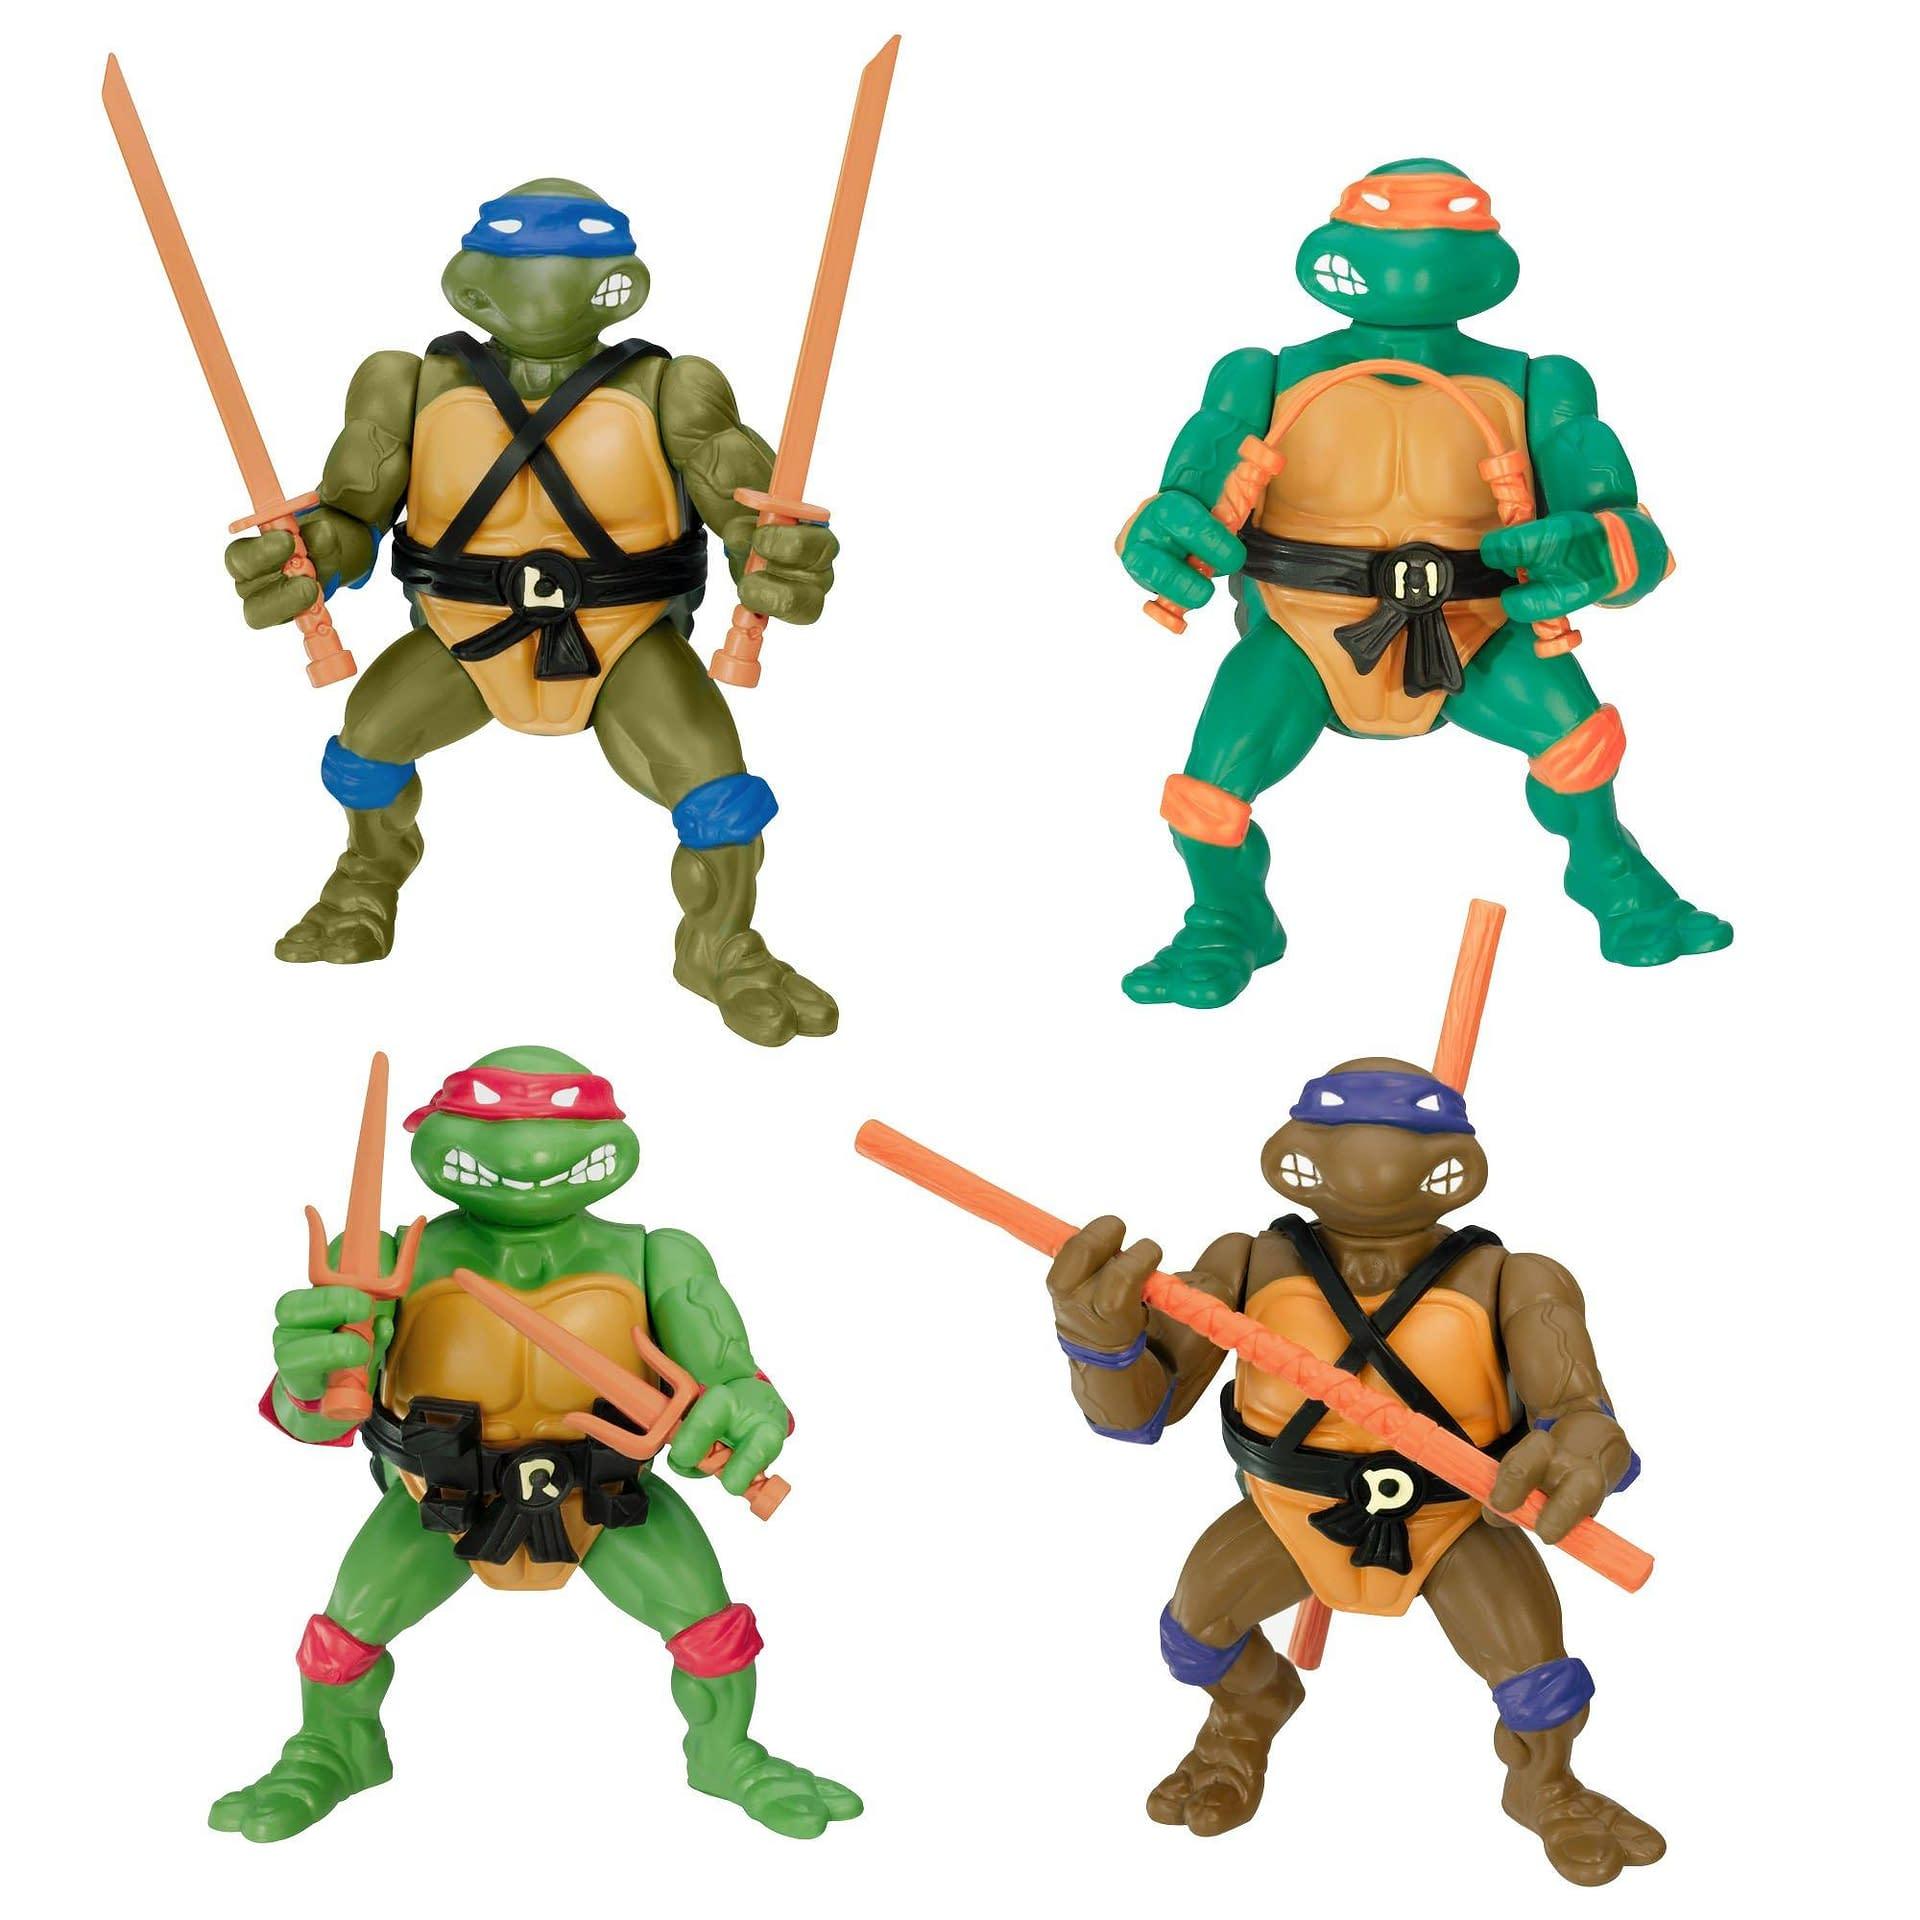 Teenage Mutant Ninja Turtles 1980s Figures Return with Gamestop